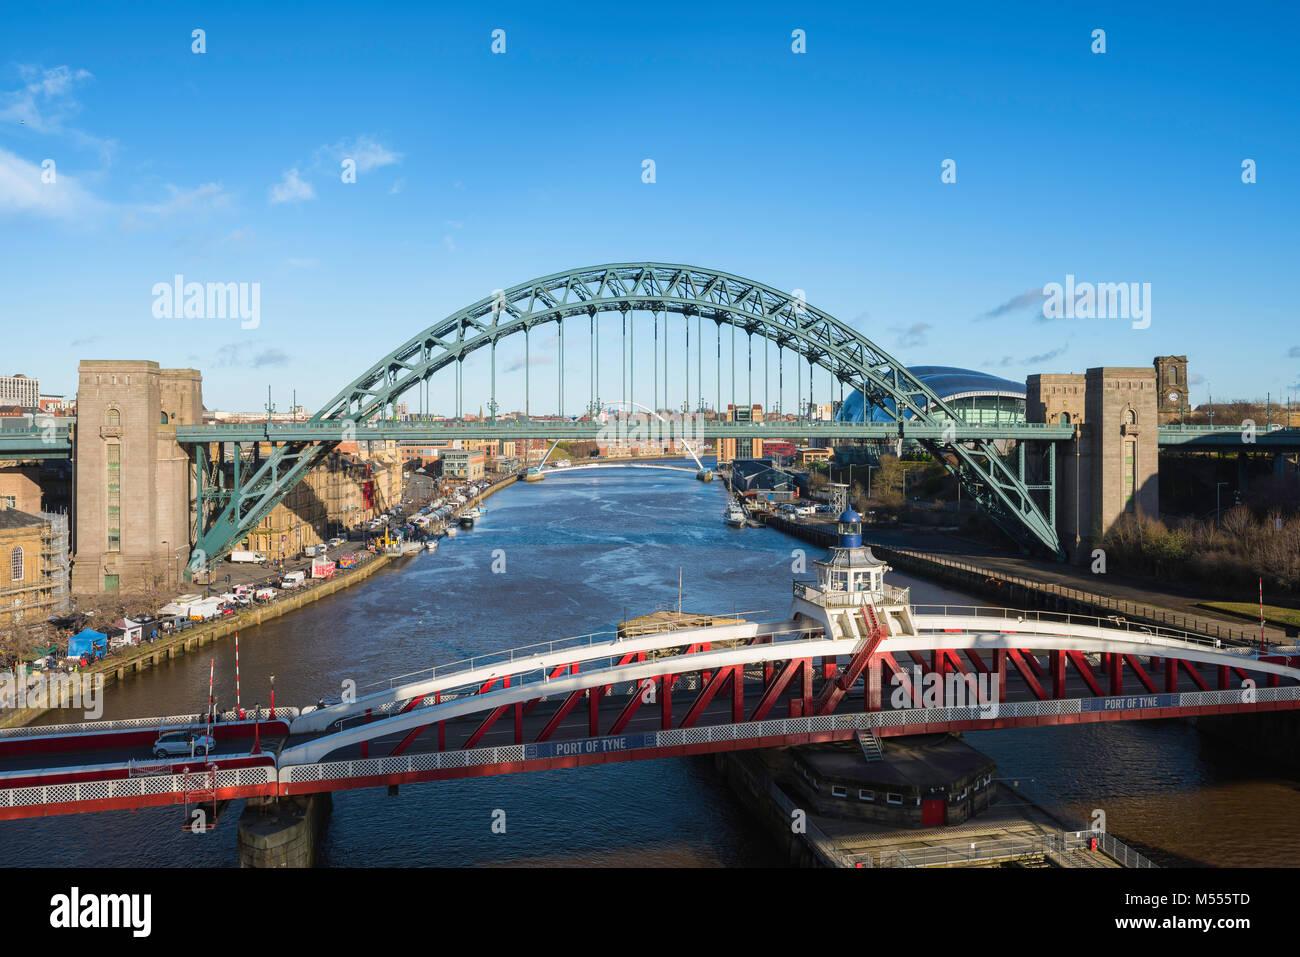 Newcastle upon Tyne, view of the the landmark Tyne Bridge and (foreground) Bridge Street swing bridge spanning the Stock Photo